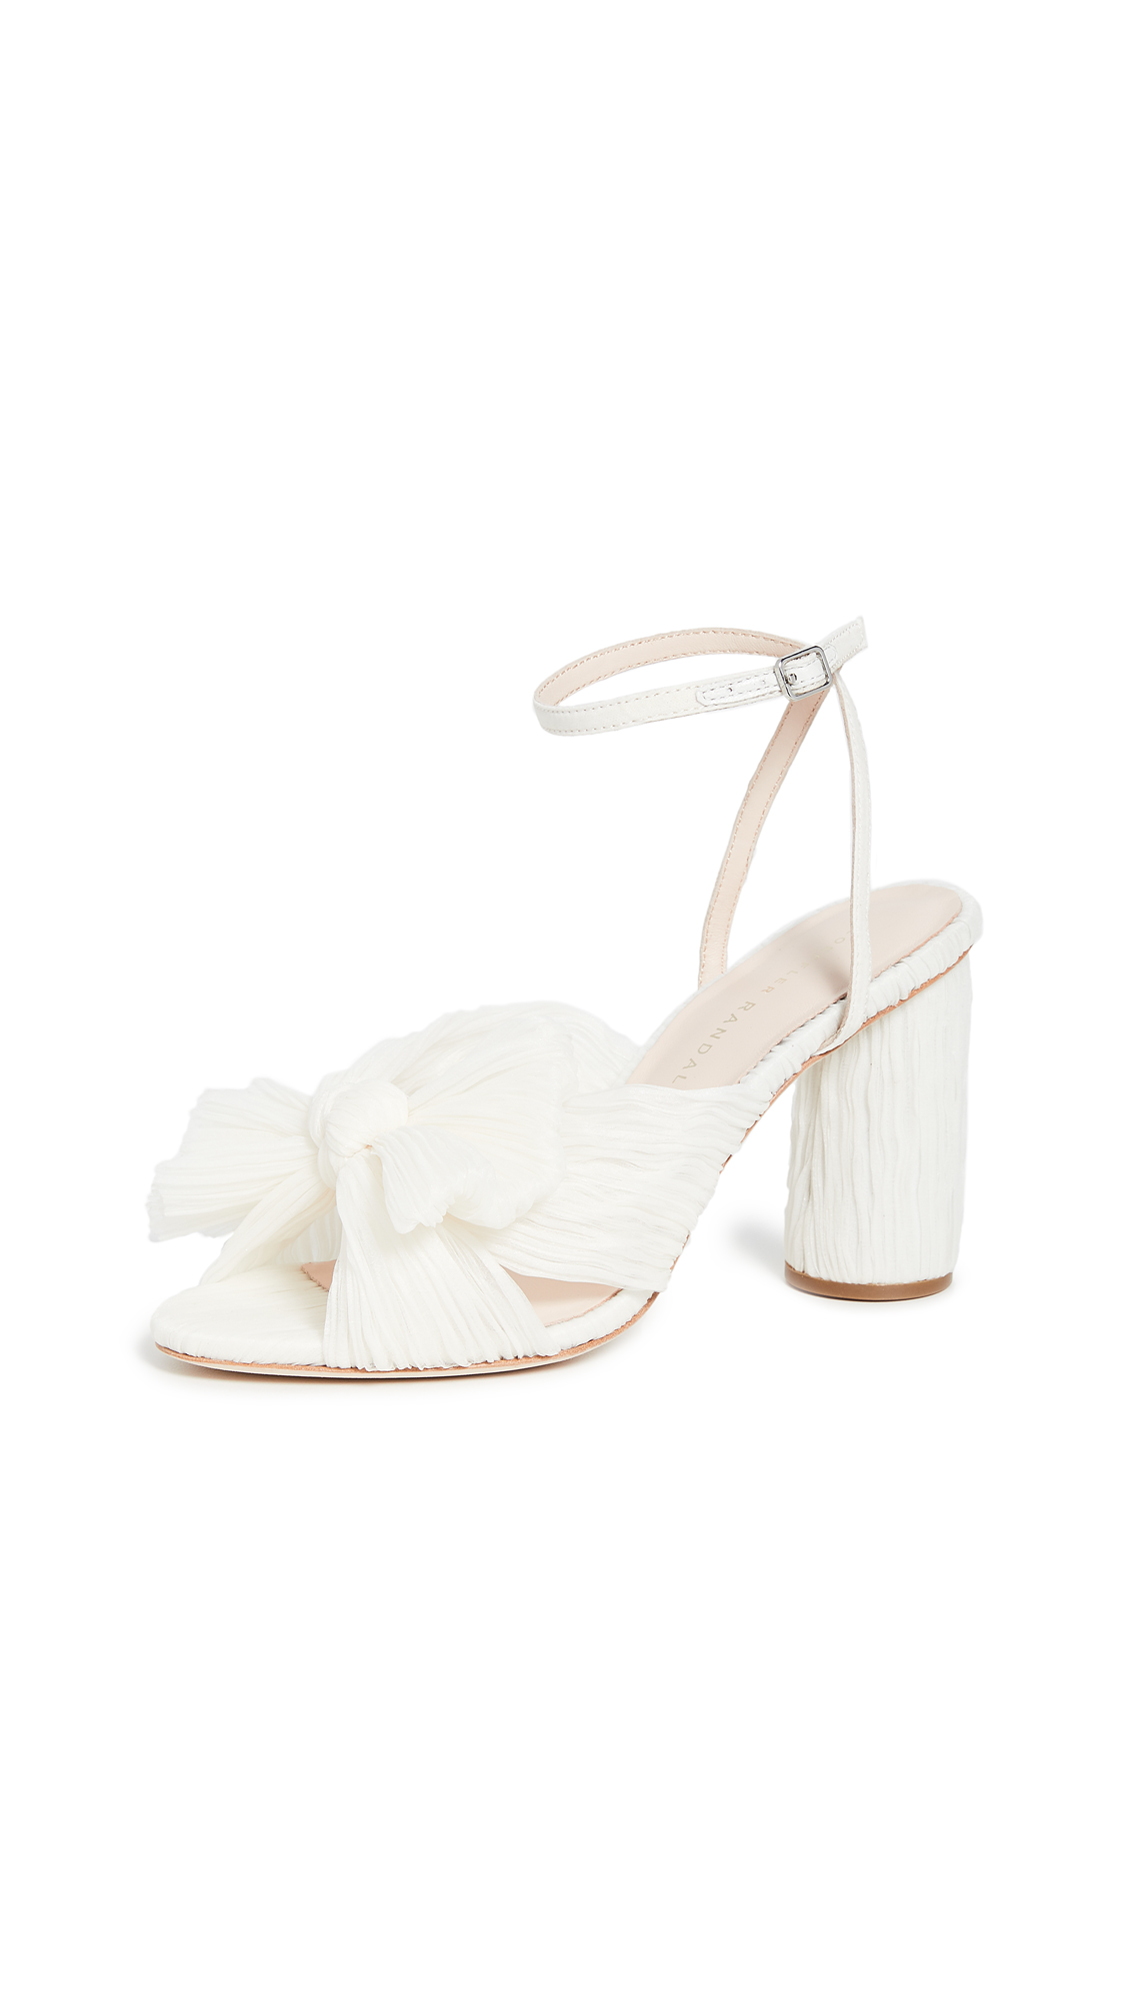 Loeffler Randall Camellia Sandals